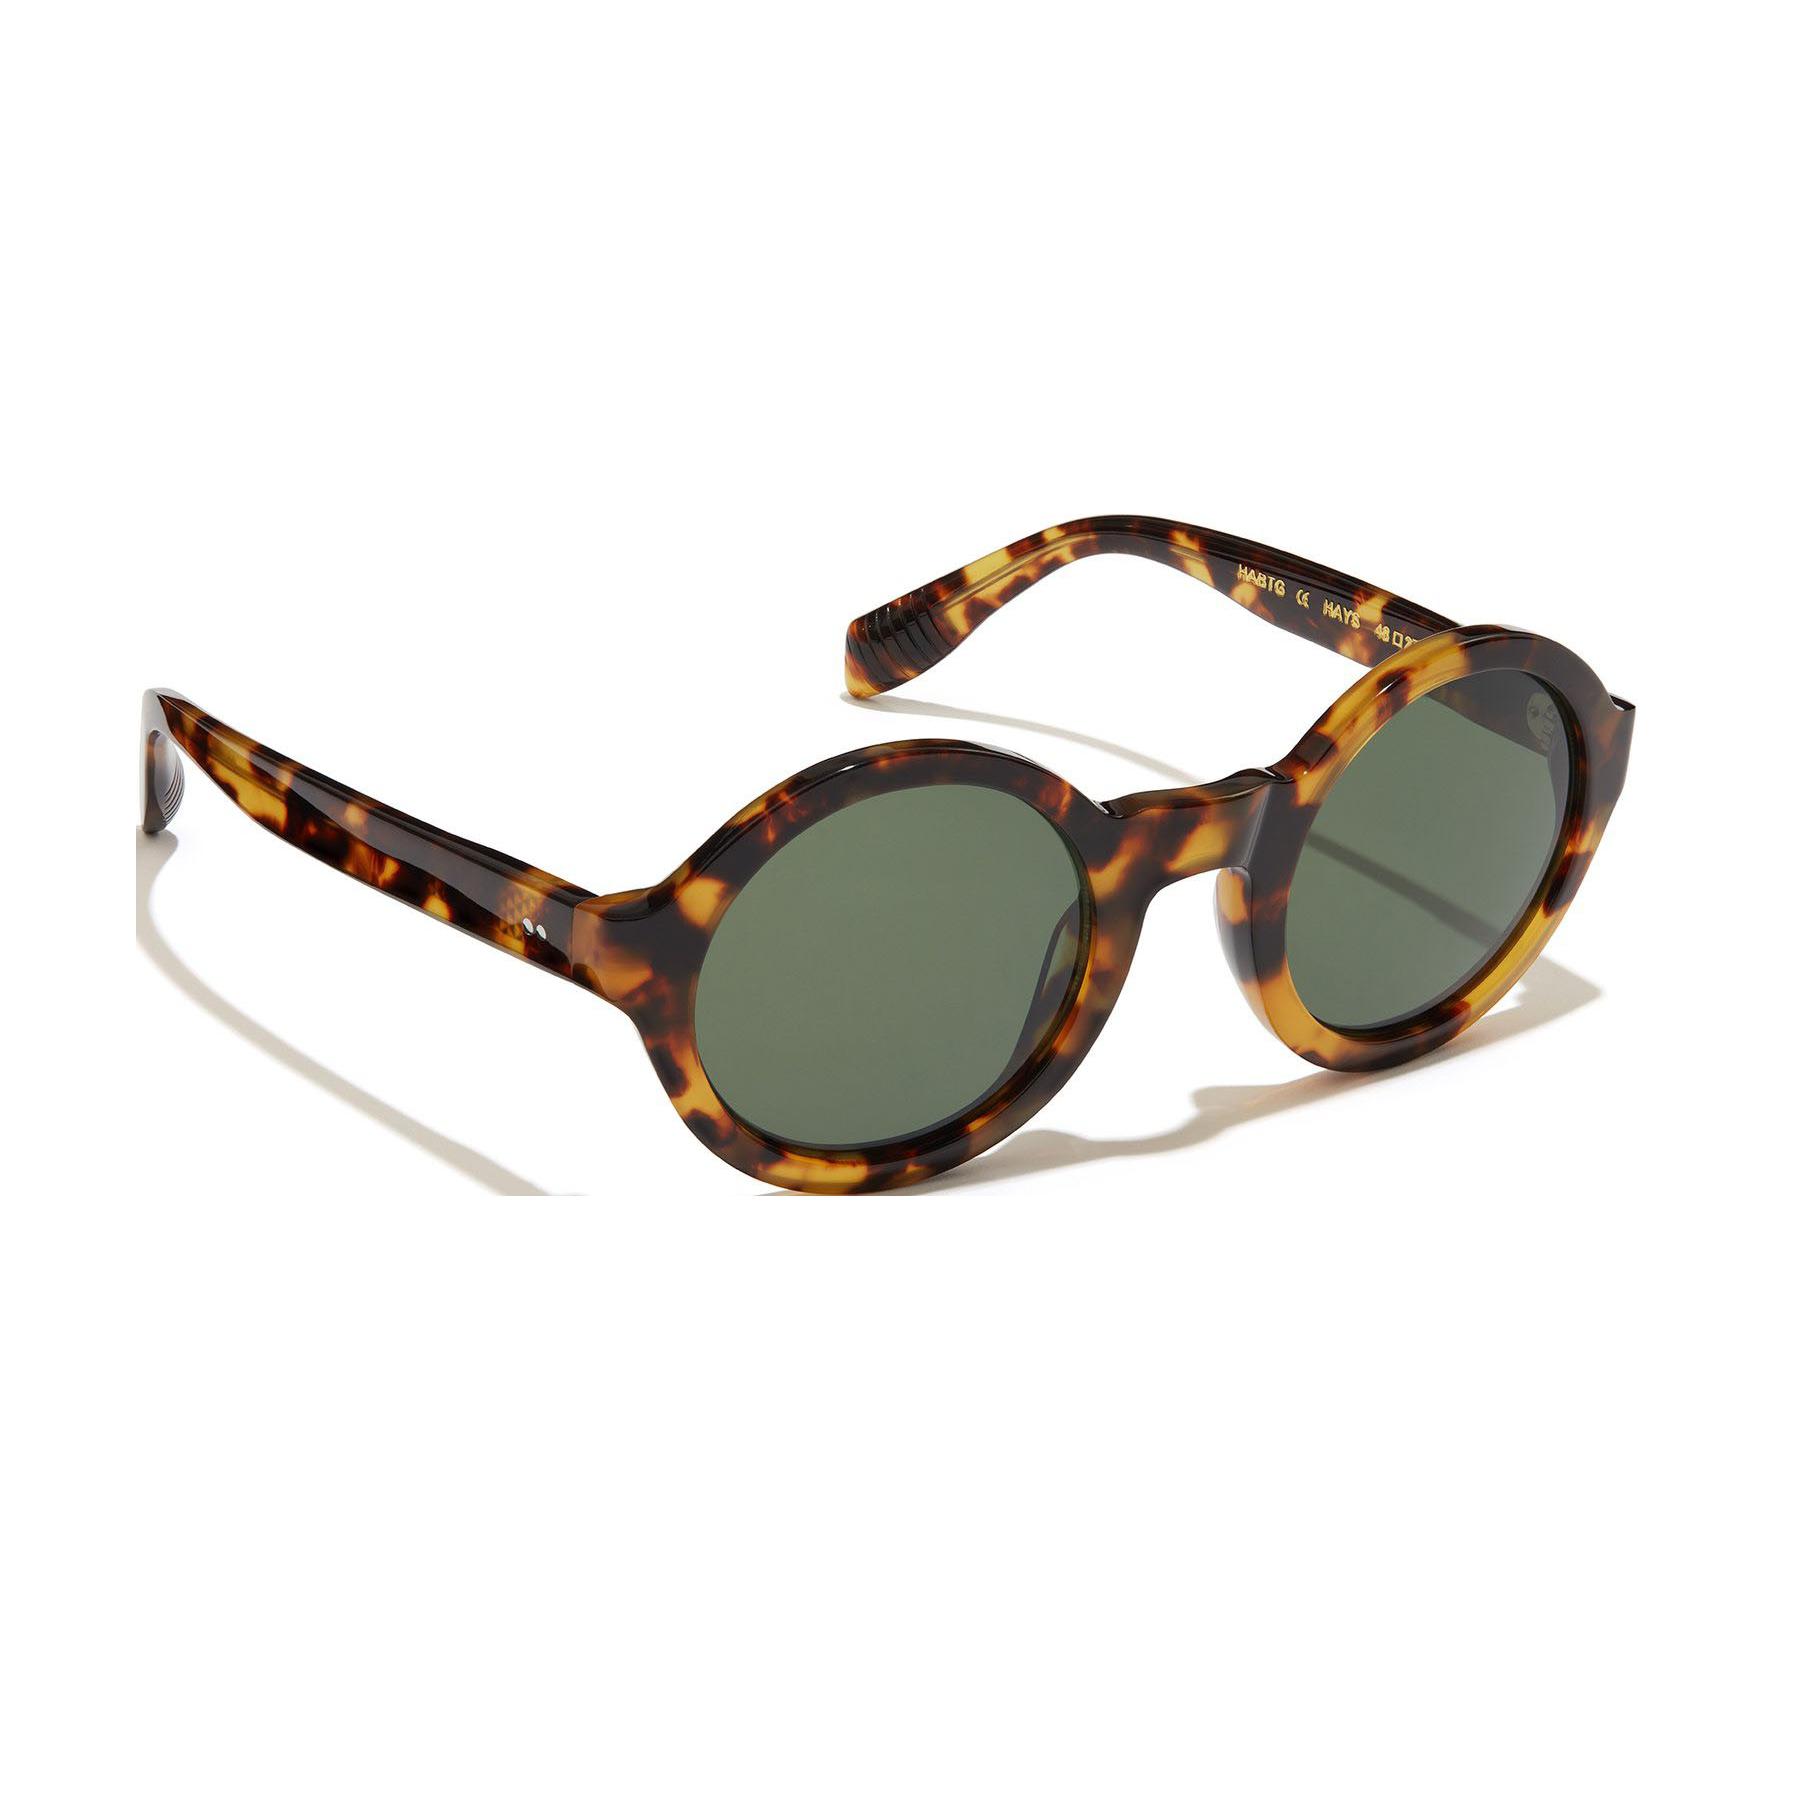 Kirk Originals Hays Bitter Tortoiseshell Sunglasses 45mm Front